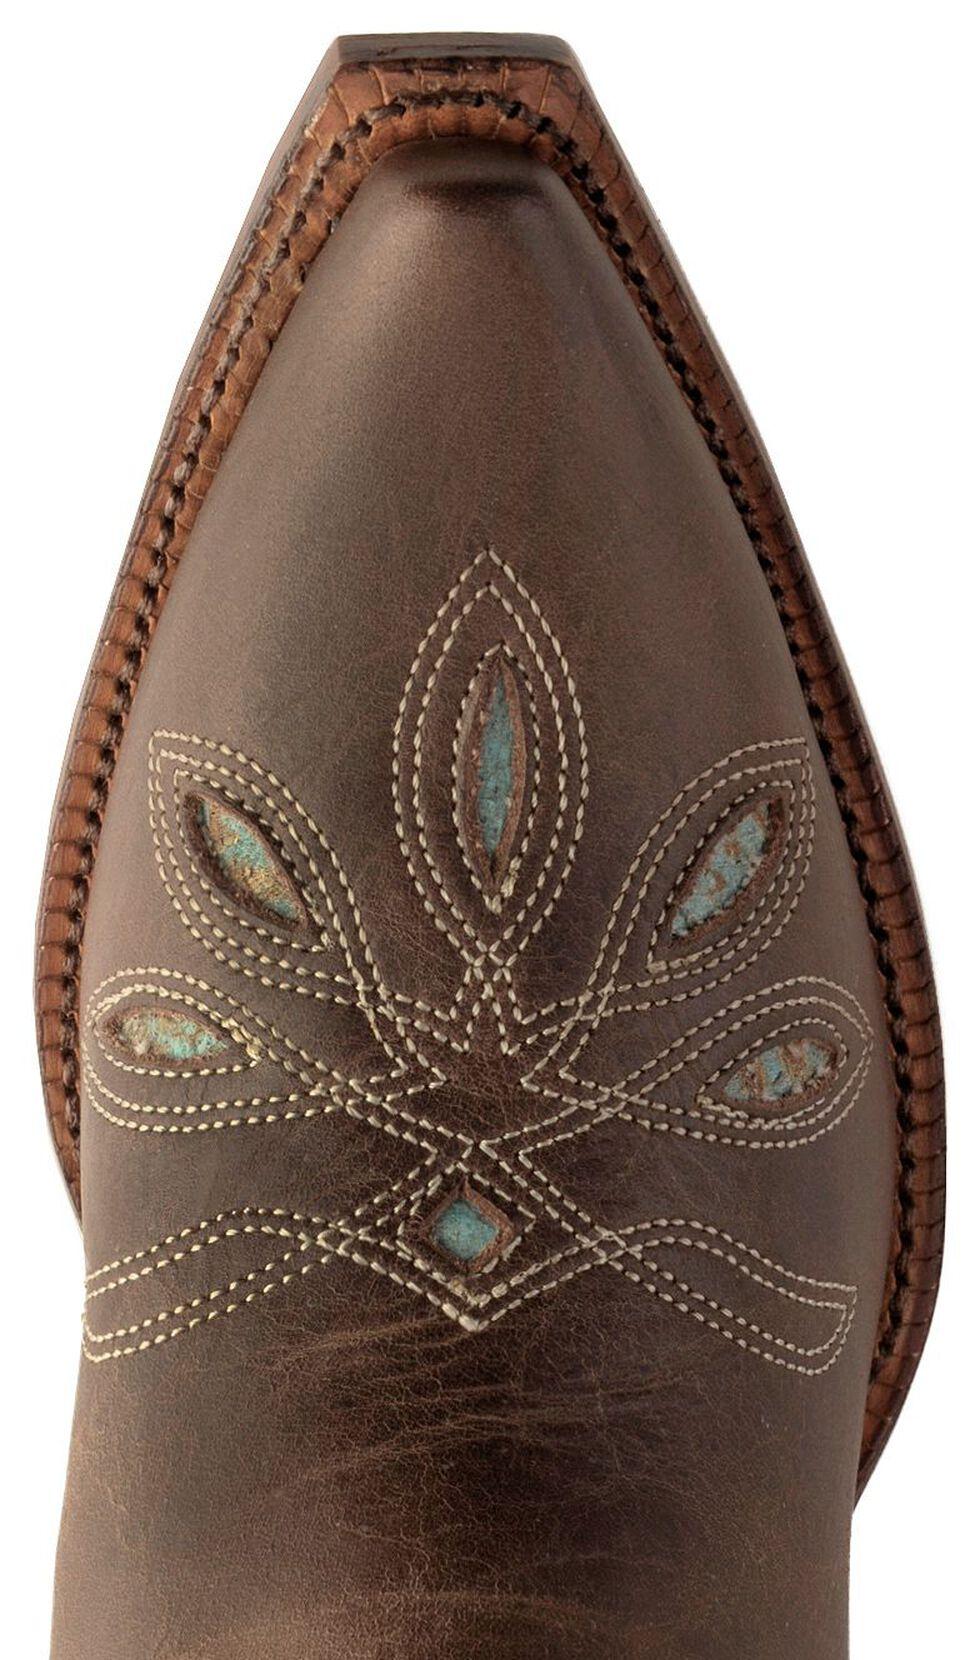 Tony Lama Vaquero Rancho Inlay Cowgirl Boots - Snip Toe, Chocolate, hi-res